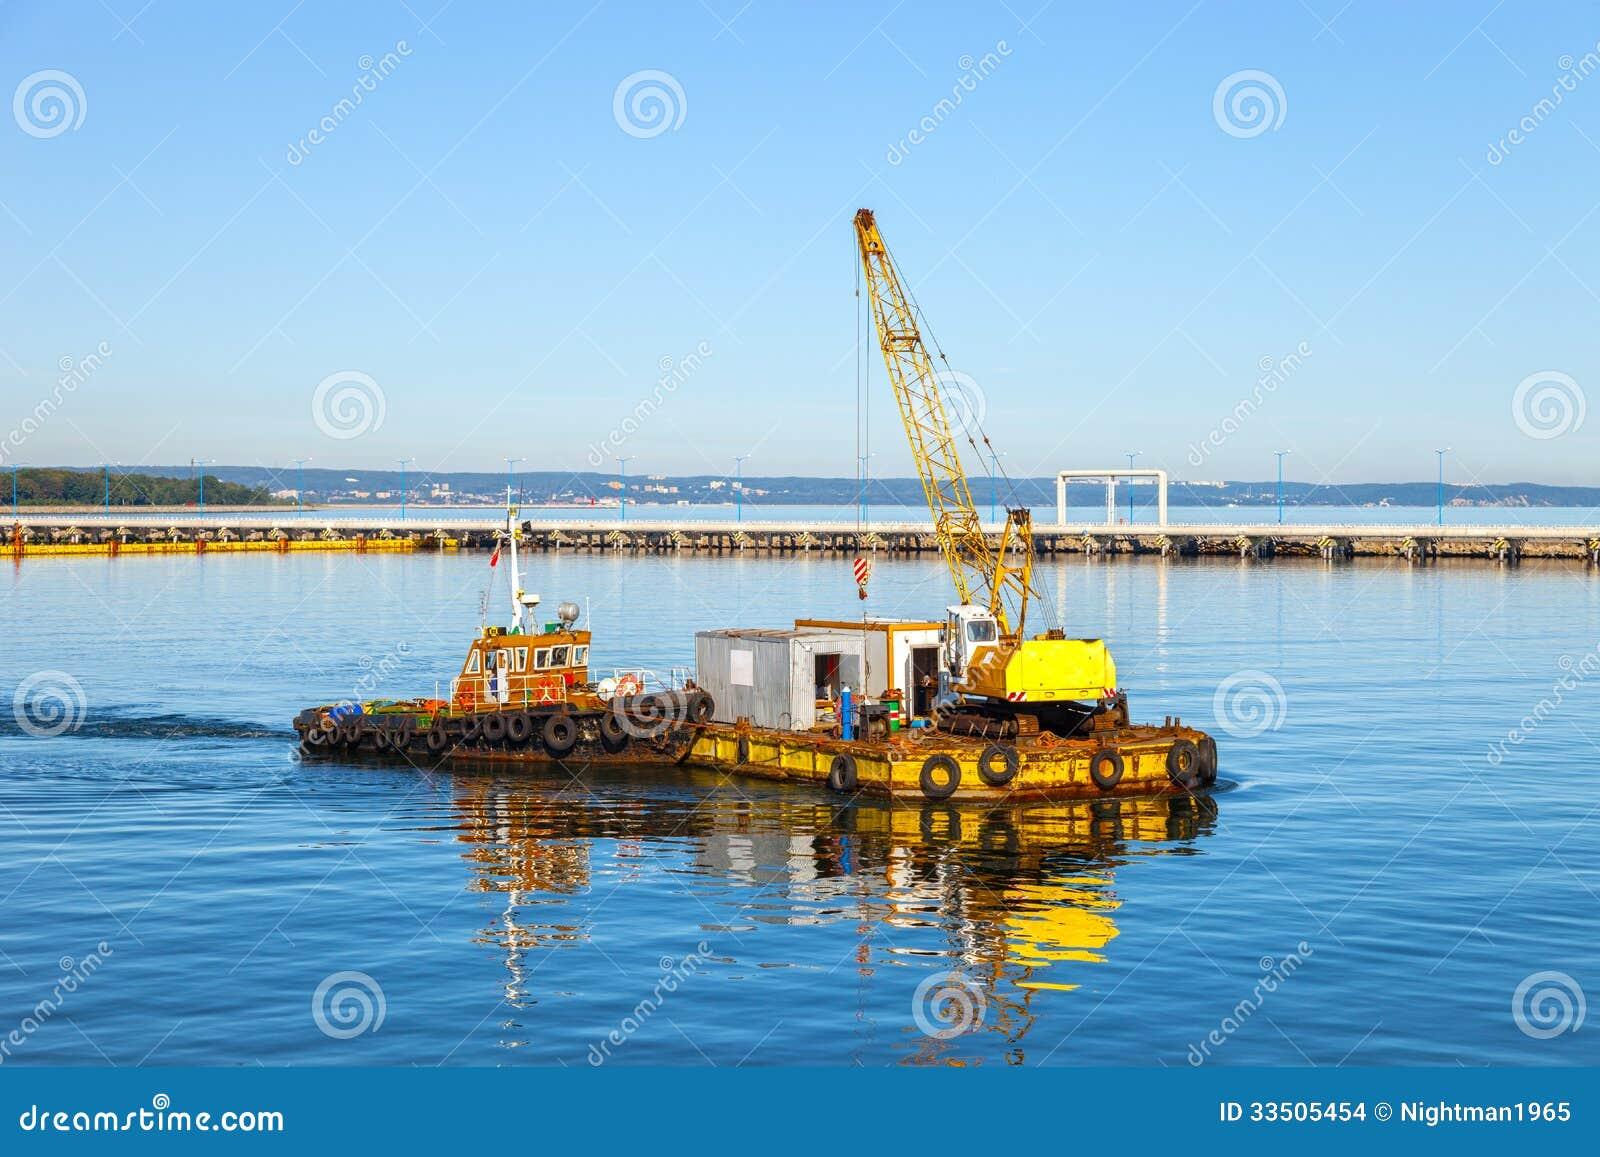 Floating Pontoon And Crane Stock Images - Image: 33505454